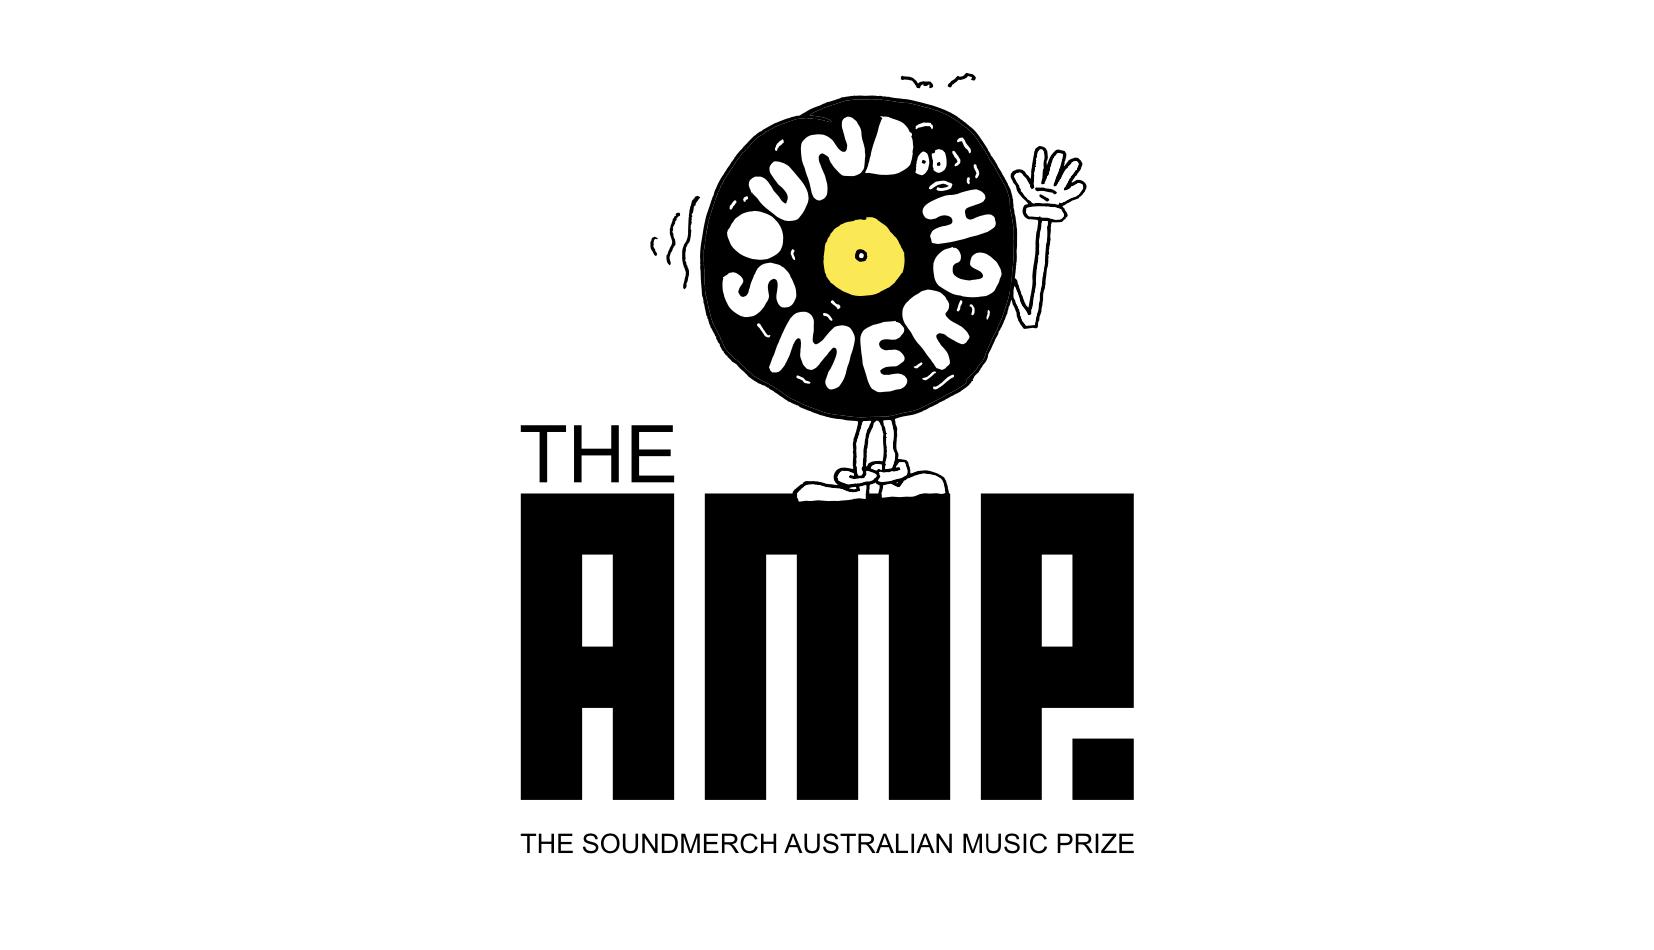 SOUNDMERCH ANNOUNCES PARTNERSHIP WITH THE AUSTRALIAN MUSIC PRIZE